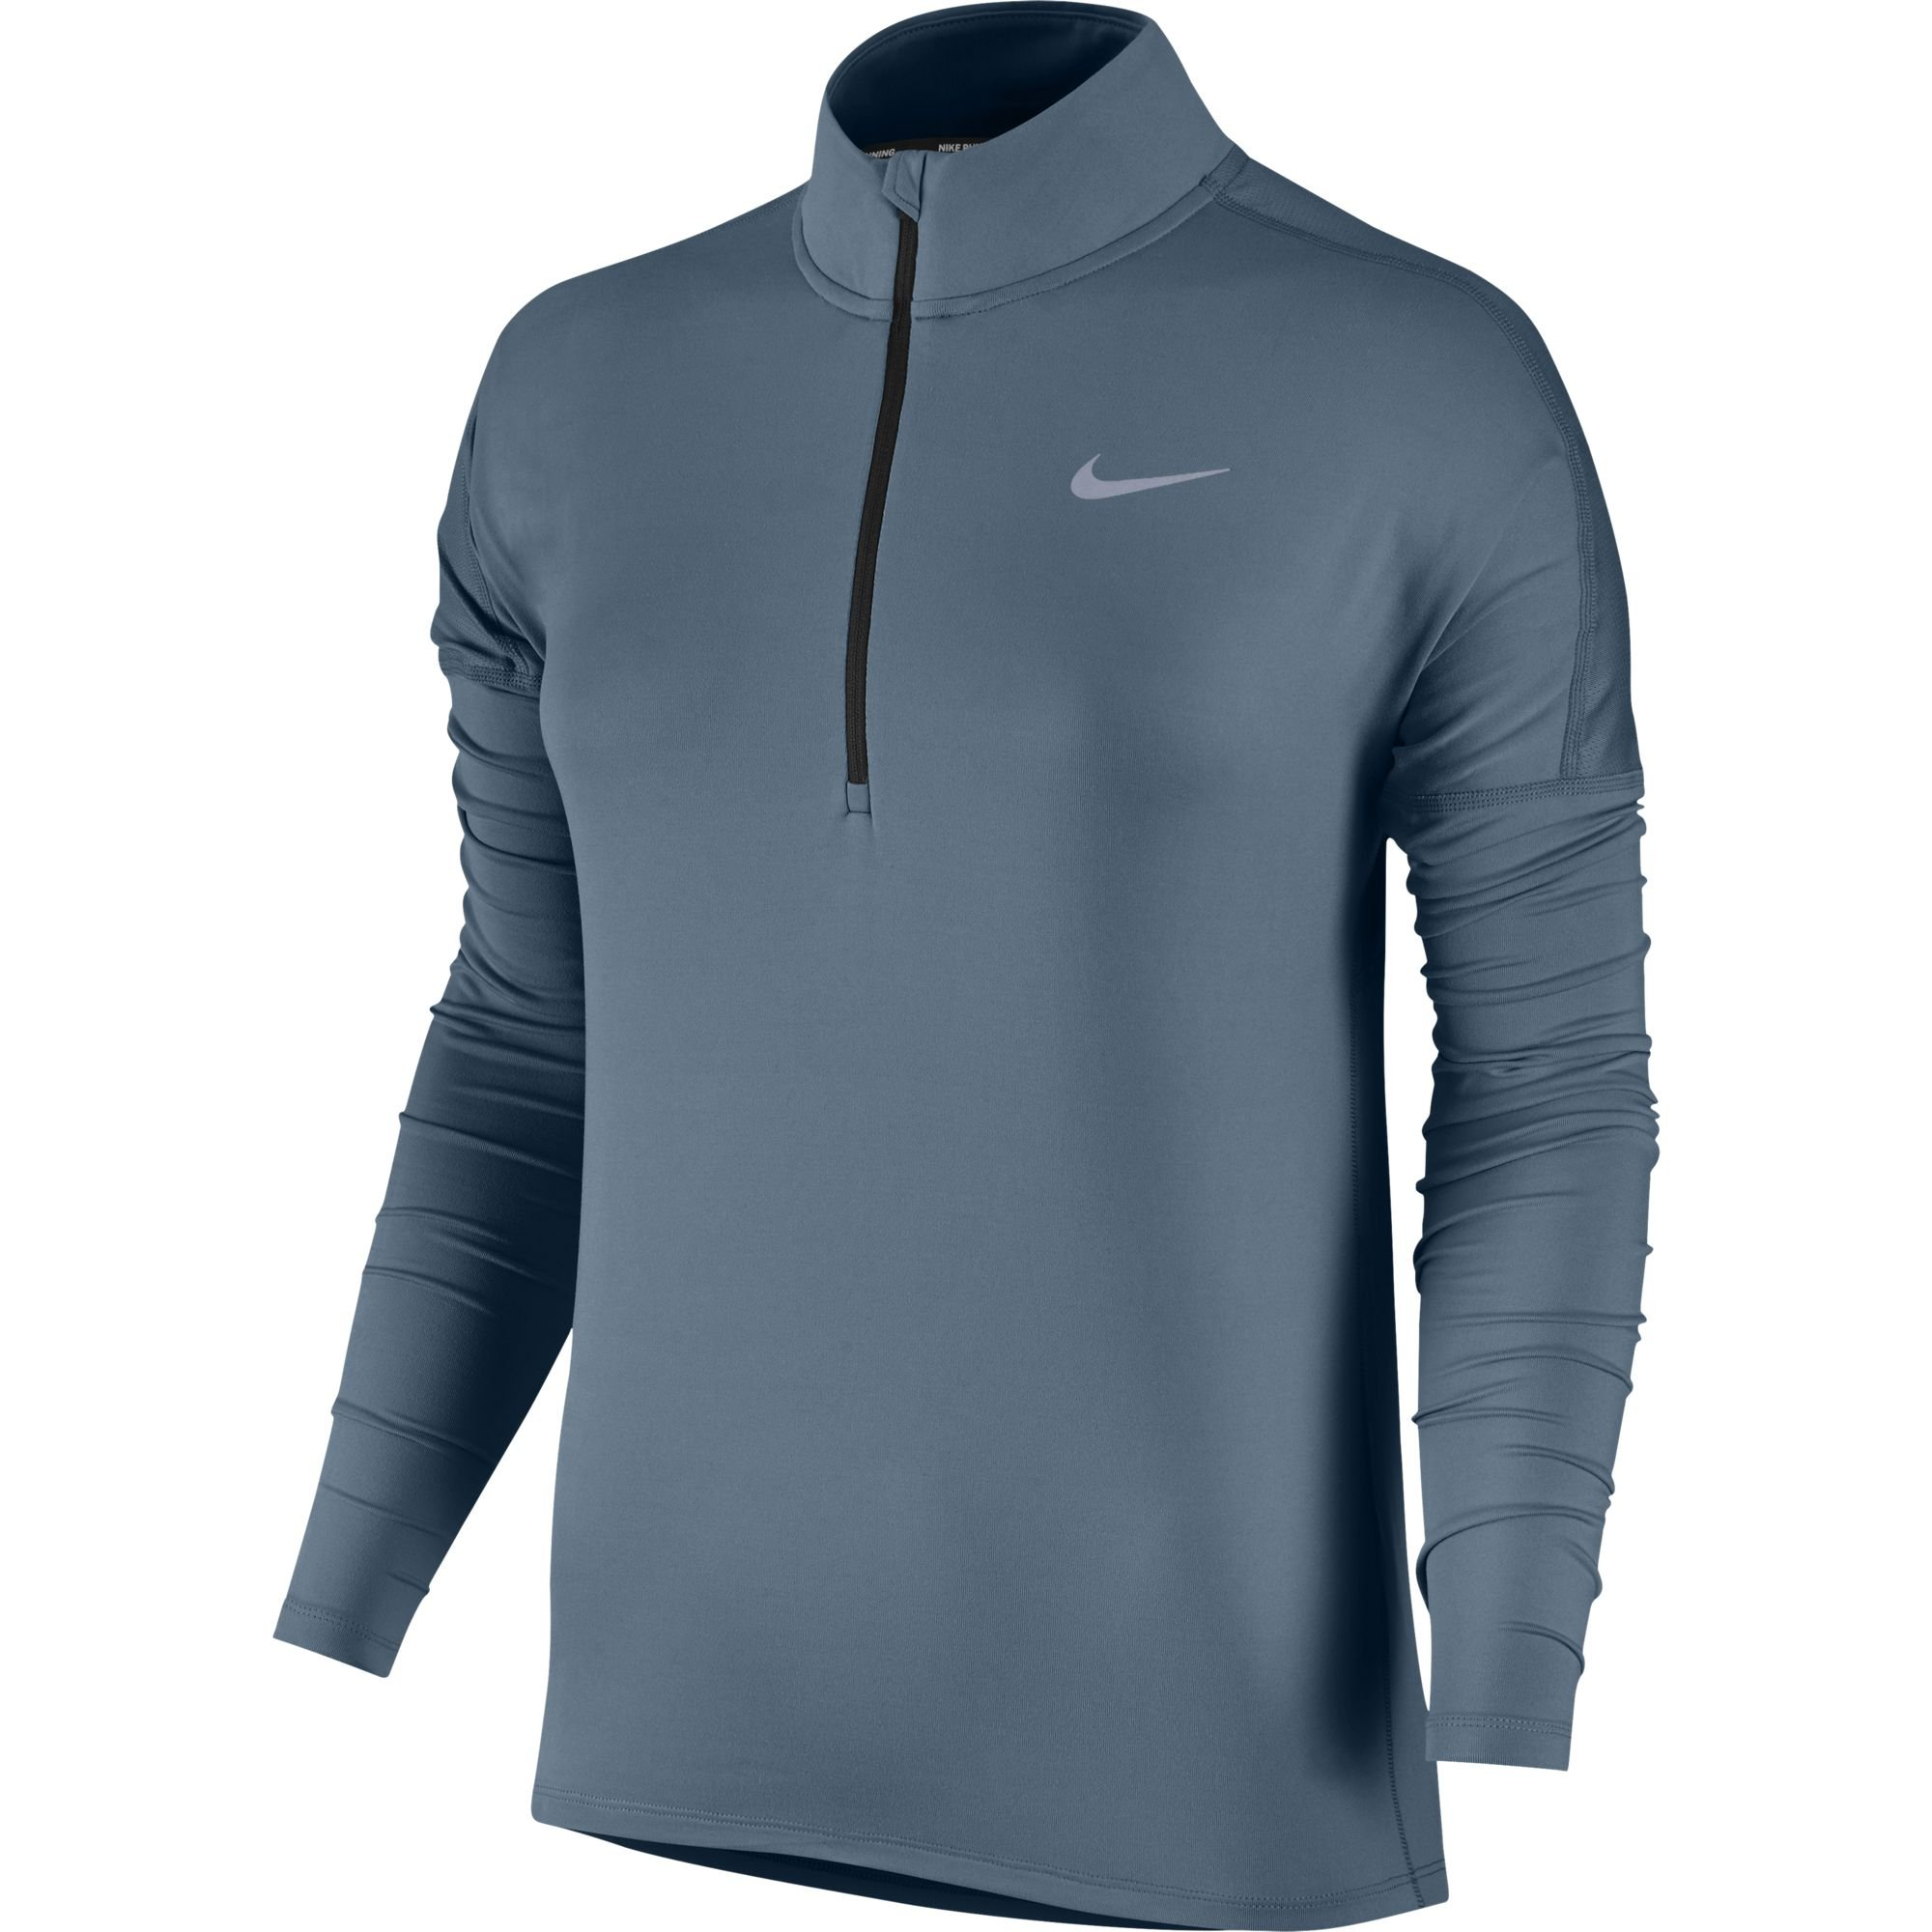 Nike Women's Dry Element Running Top Armory Blue/Heather Size Medium